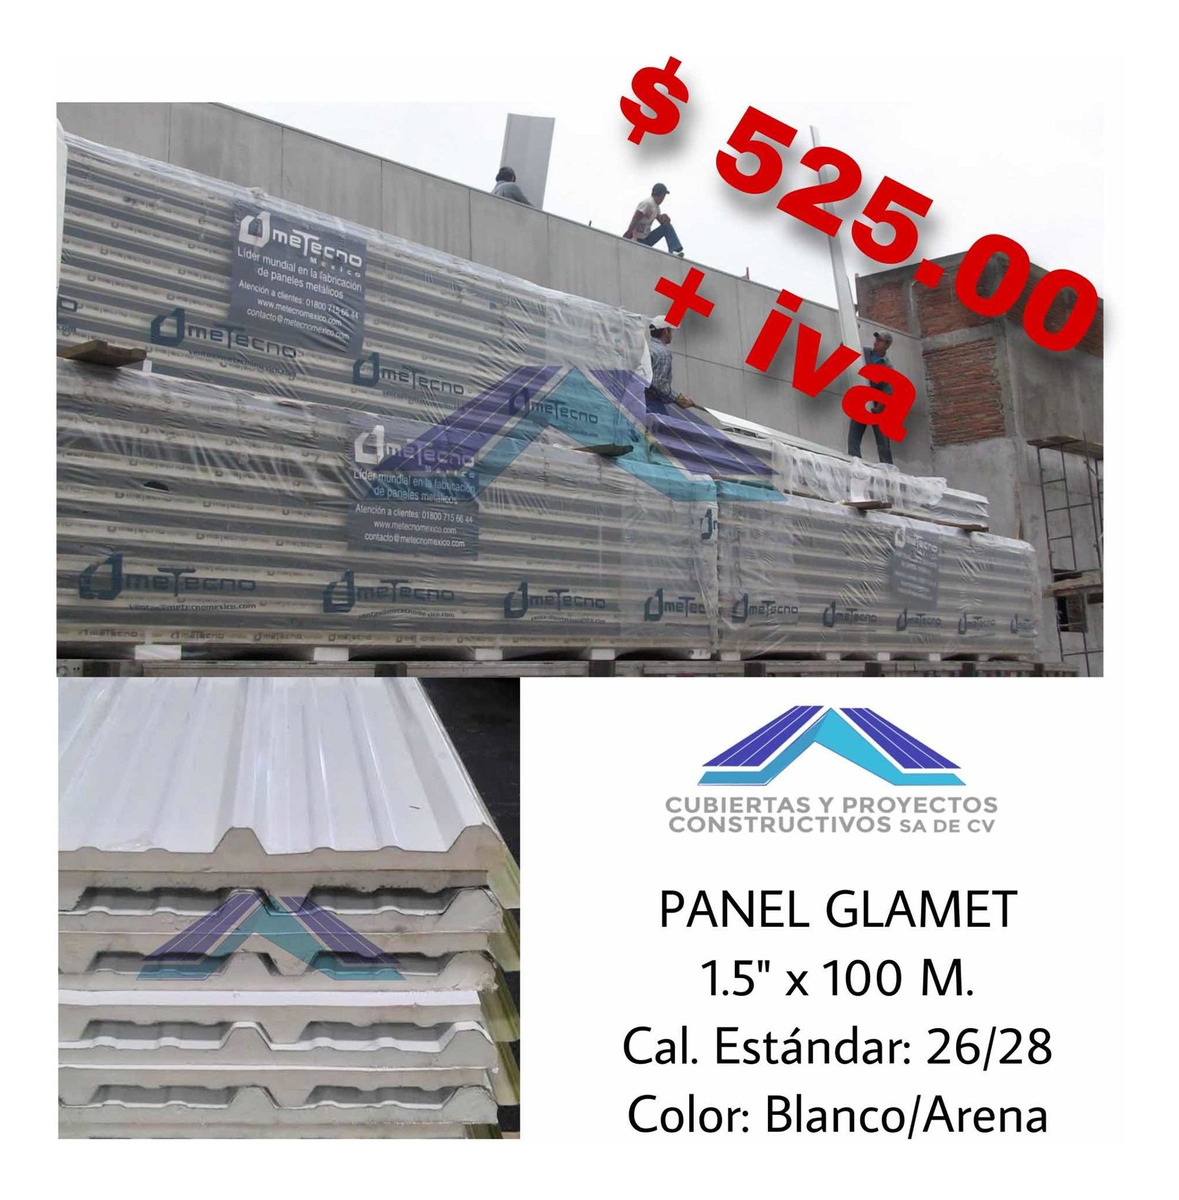 panel glamet o multipanel